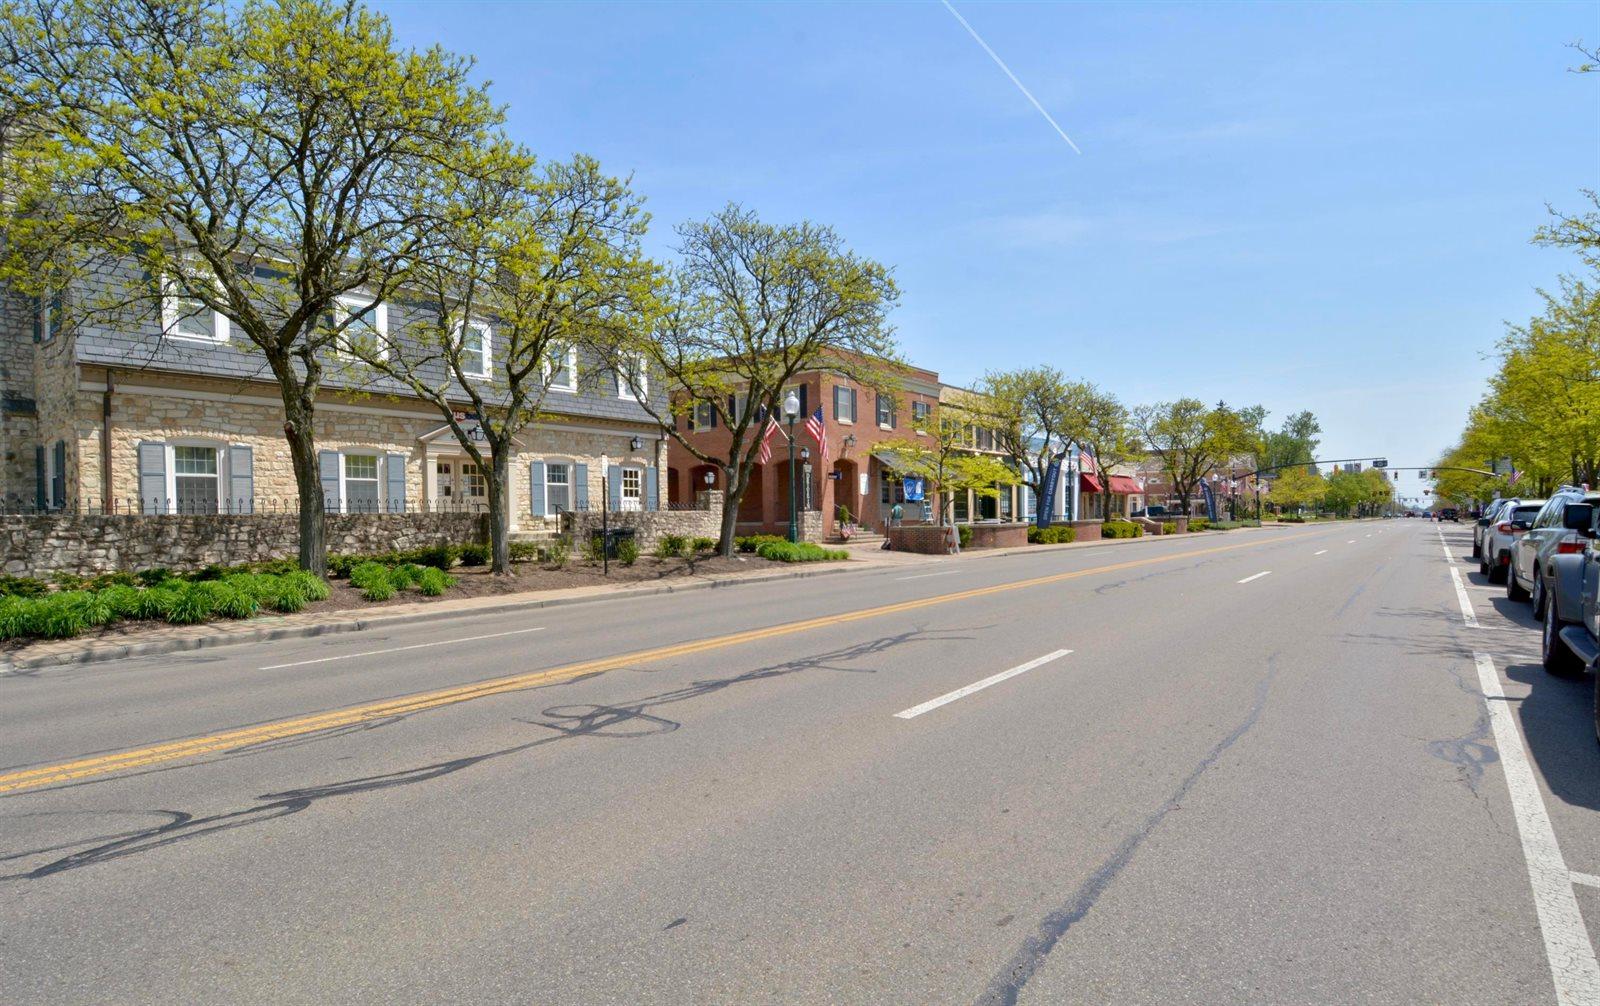 1001 High Street, Worthington, OH 43085